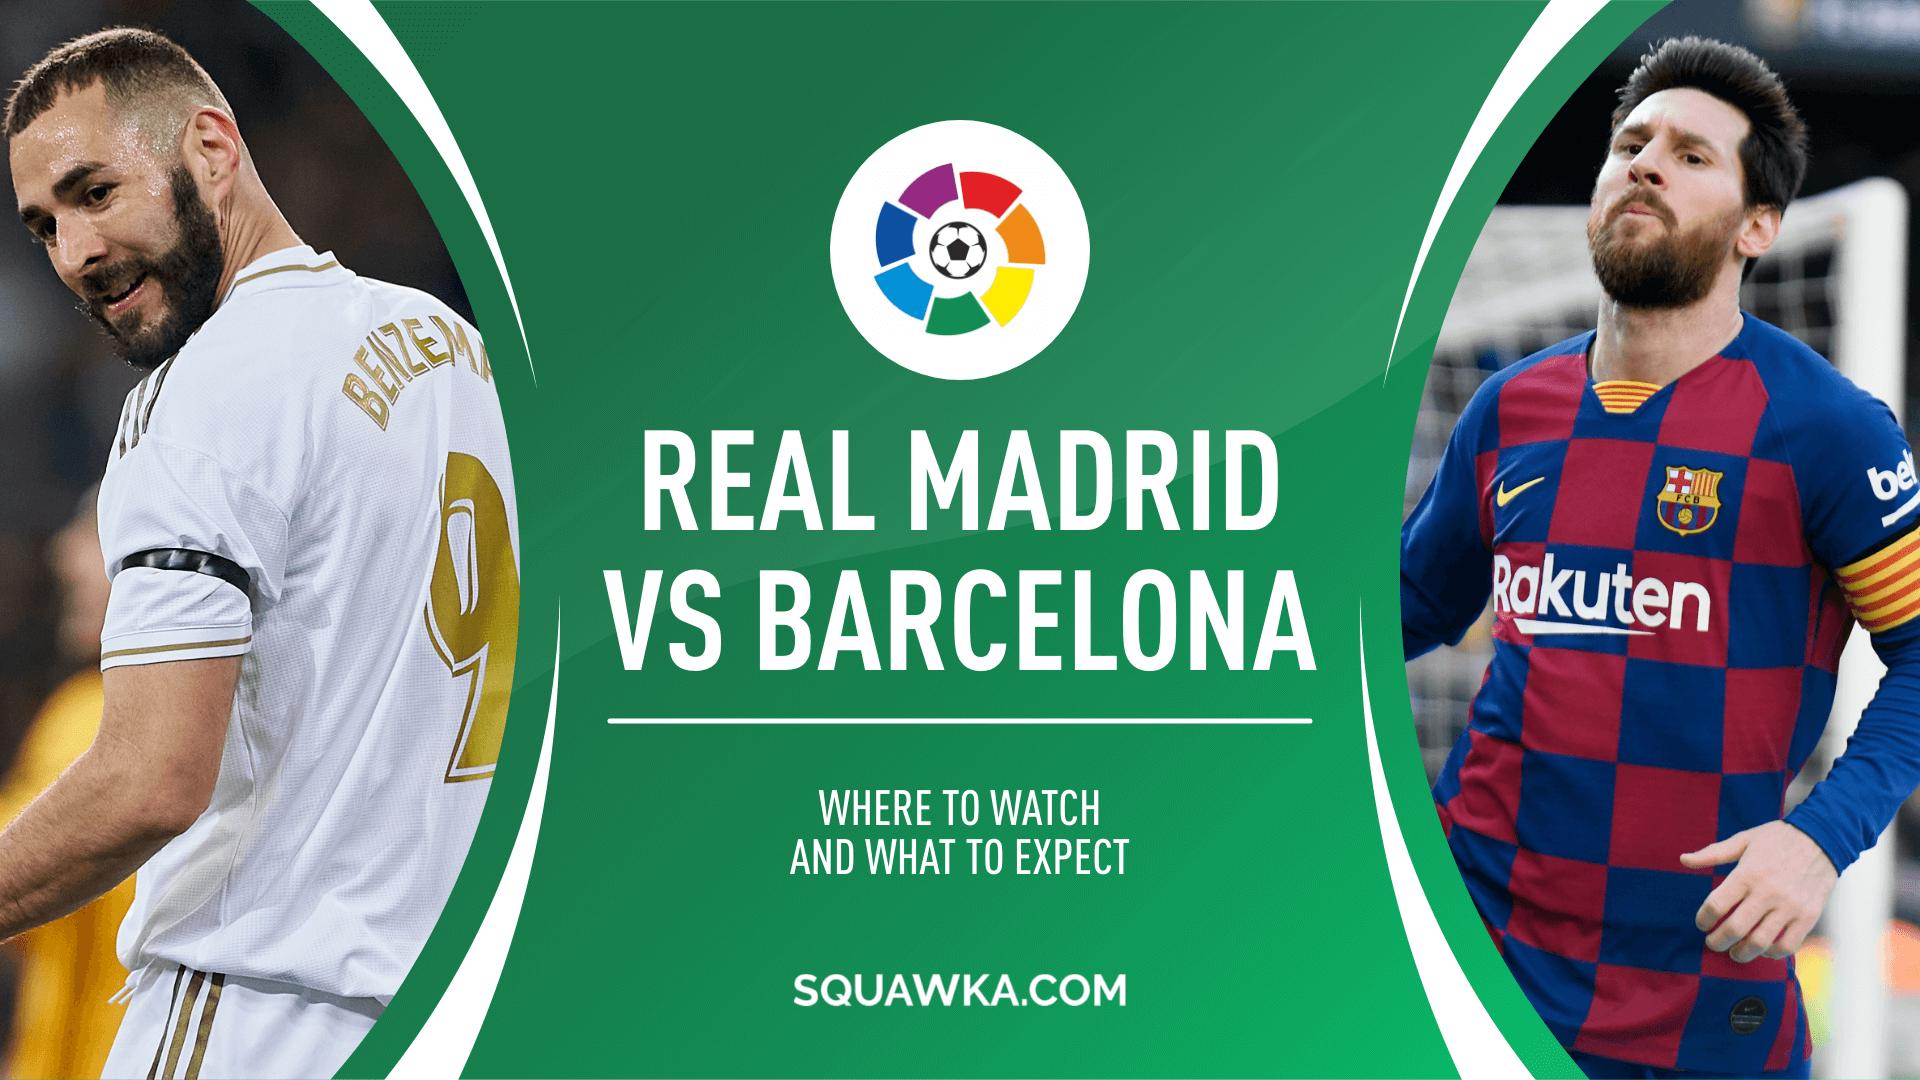 El Clasico Real Madrid Vs Barcelona 2020 , HD Wallpaper & Backgrounds